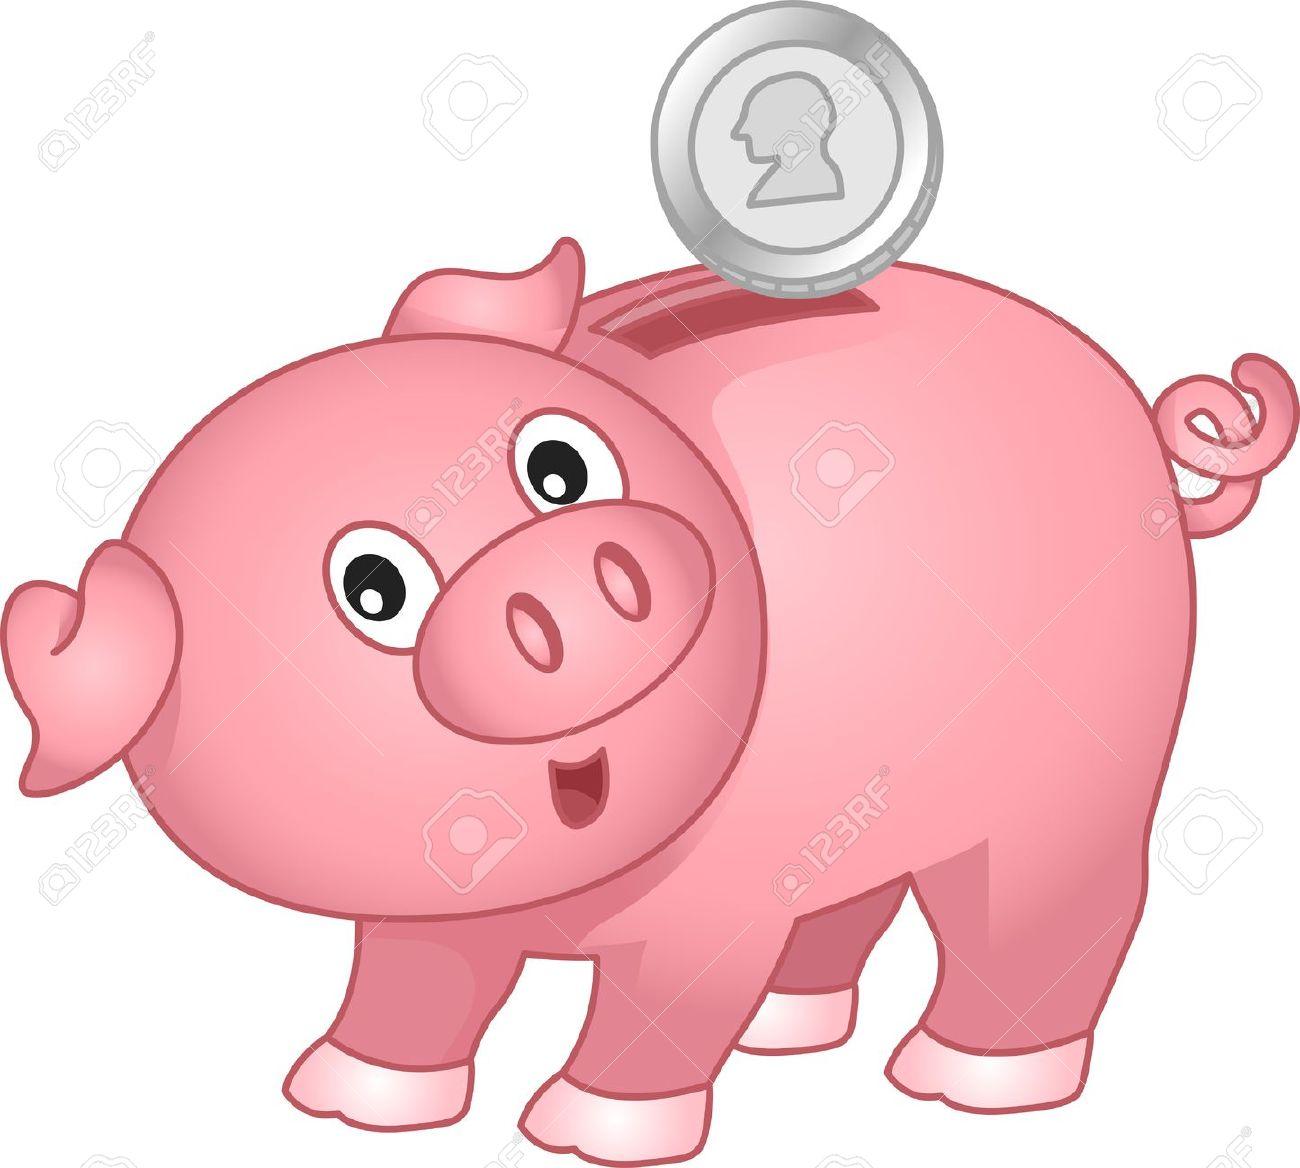 HBCU Money's 2015 Top 10 HBCU Endowments